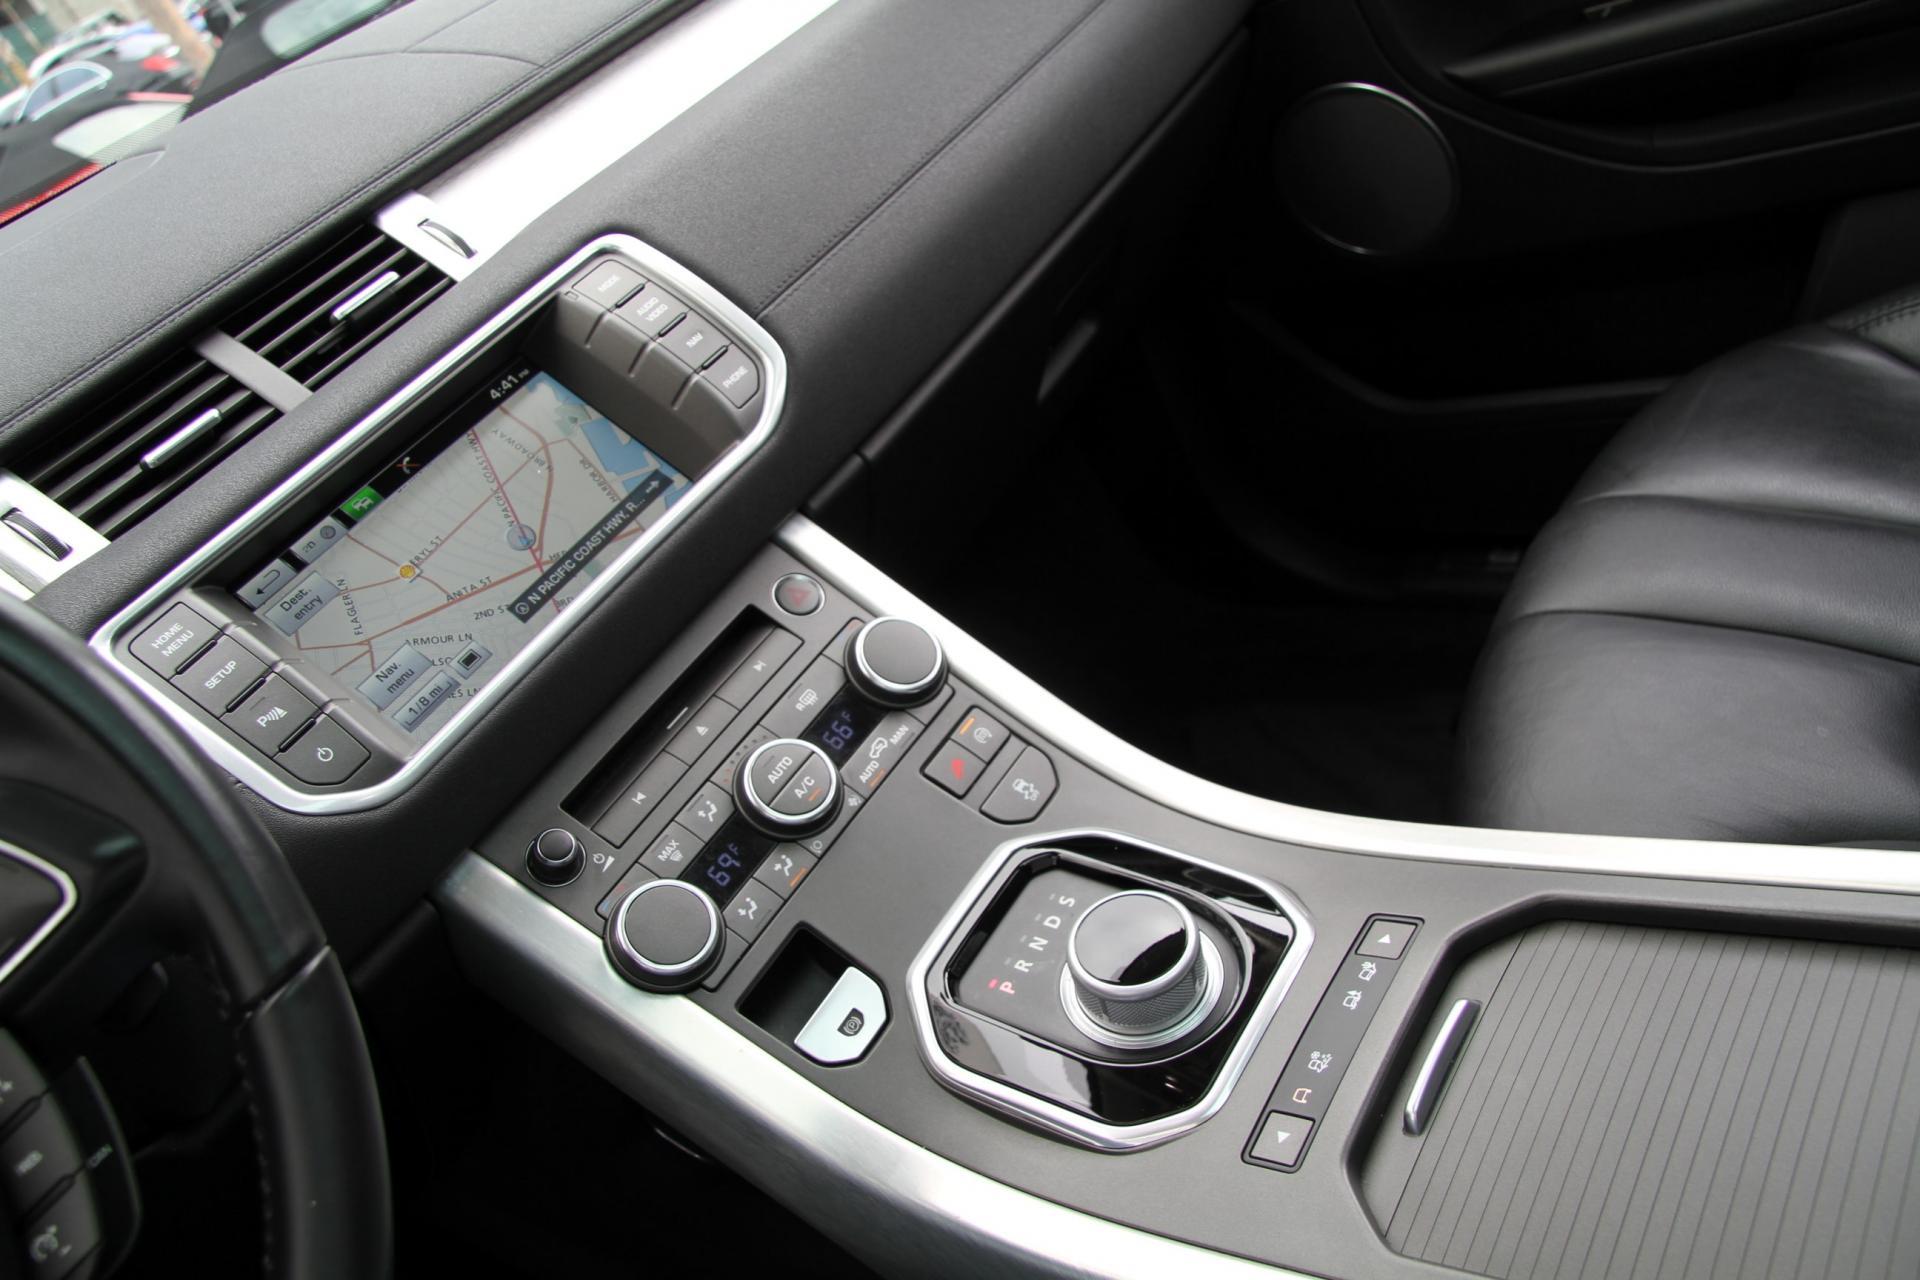 Land Rover For Sale Near Me >> 2014 Land Rover Range Rover Evoque PURE PLUS Stock # 6234 ...